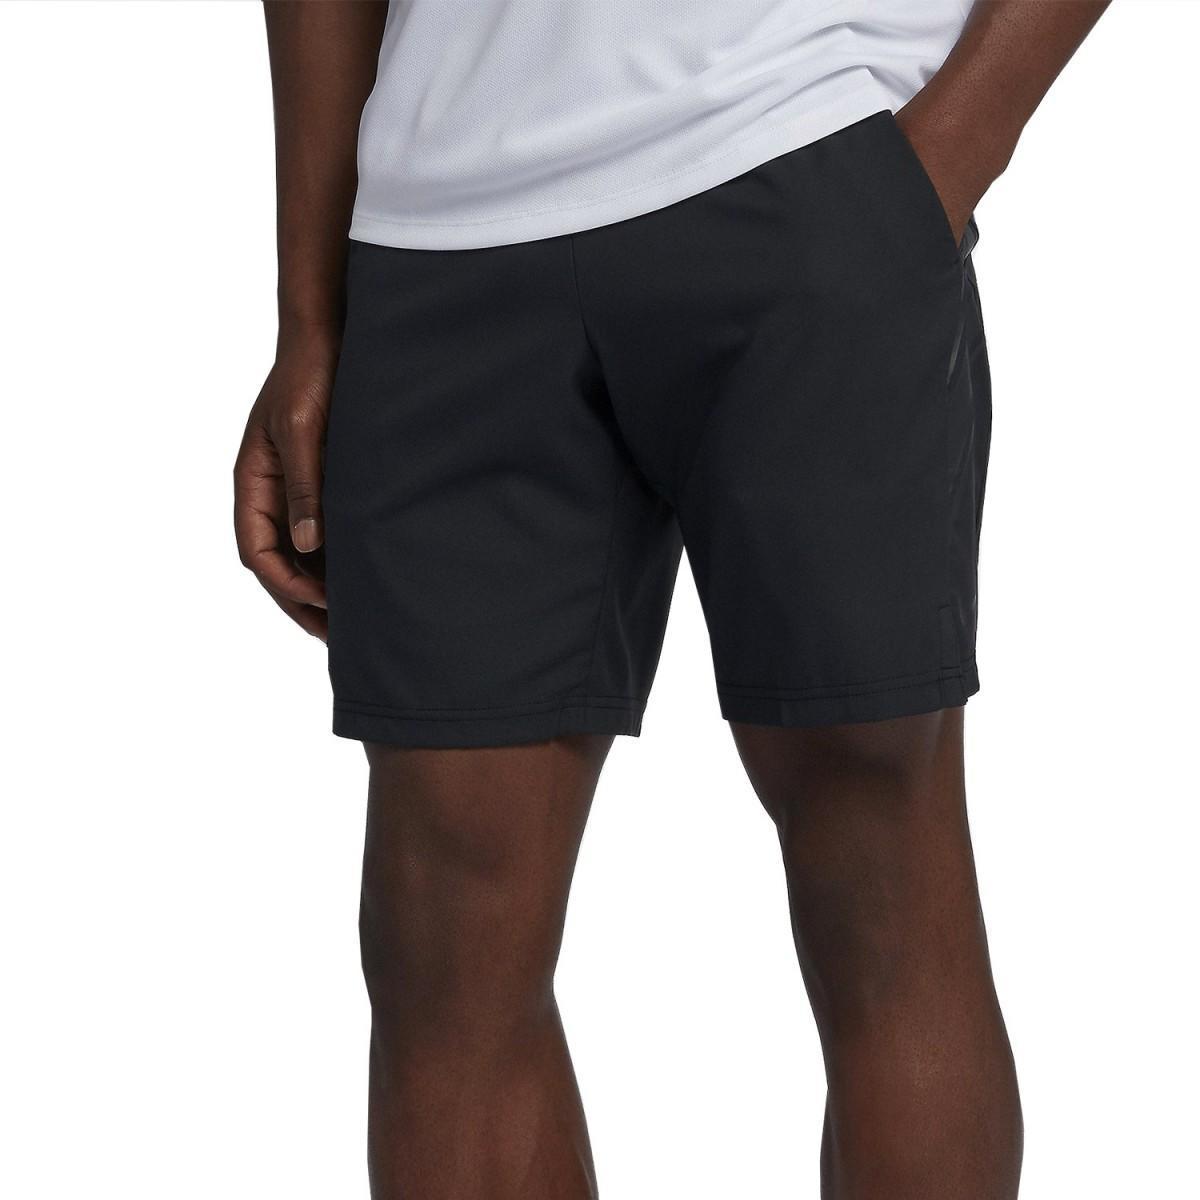 Теннисные шорты мужские Nike Court Dry 9in Short black/black